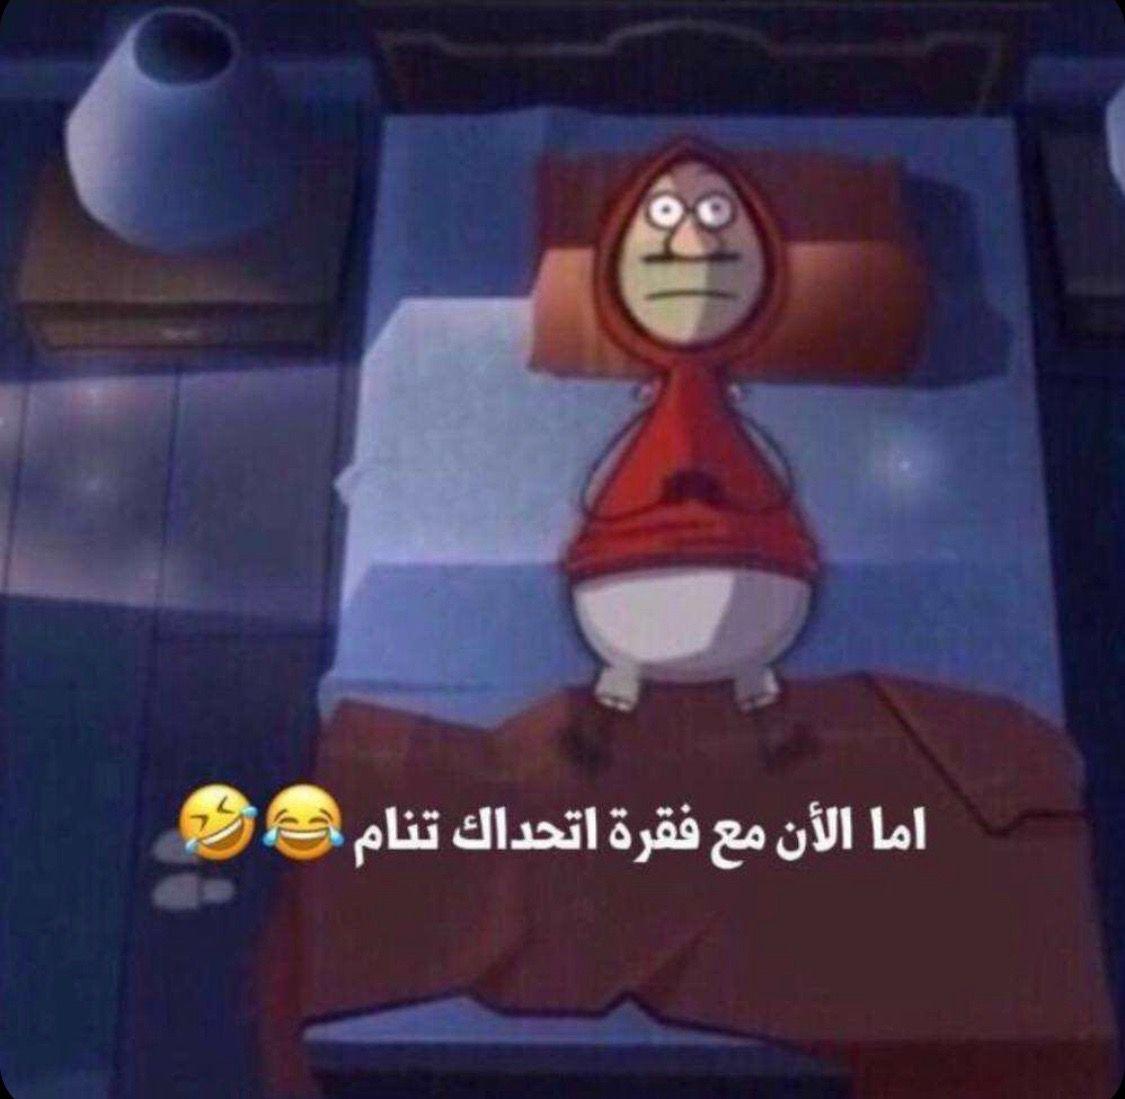 Pin By Samar Anan On رمضان والعيد Funny School Memes Funny Words Arabic Funny